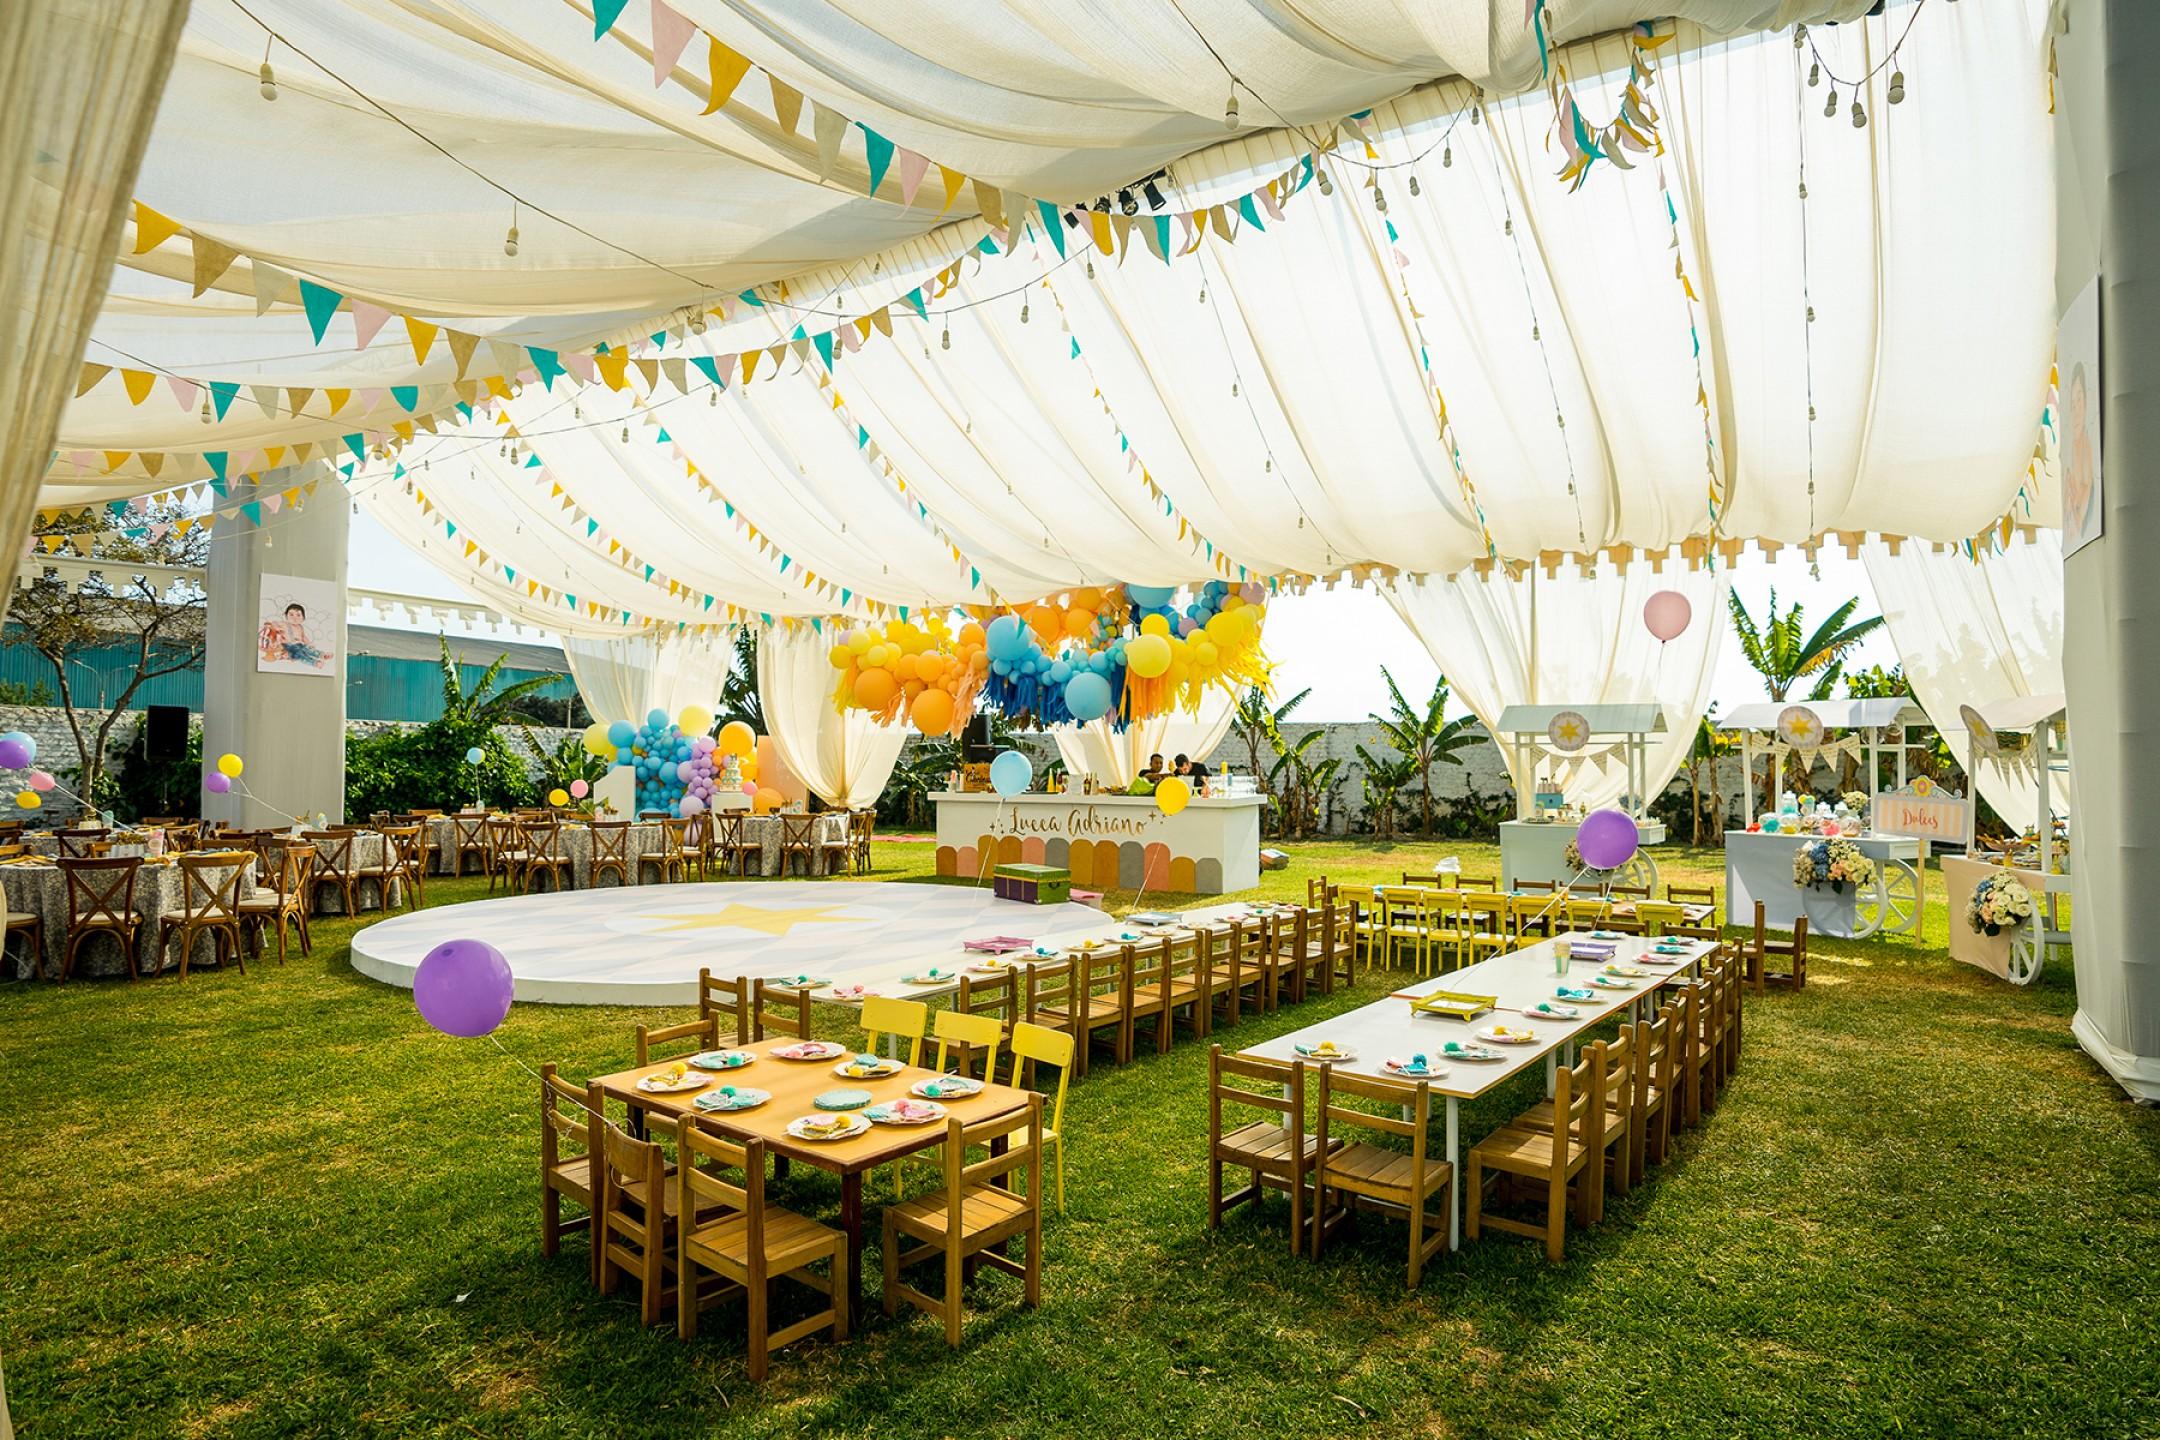 http://haciendabocanegra.com/images/chbn_400NCEa9wf_large-1080_rr6Tl.jpg